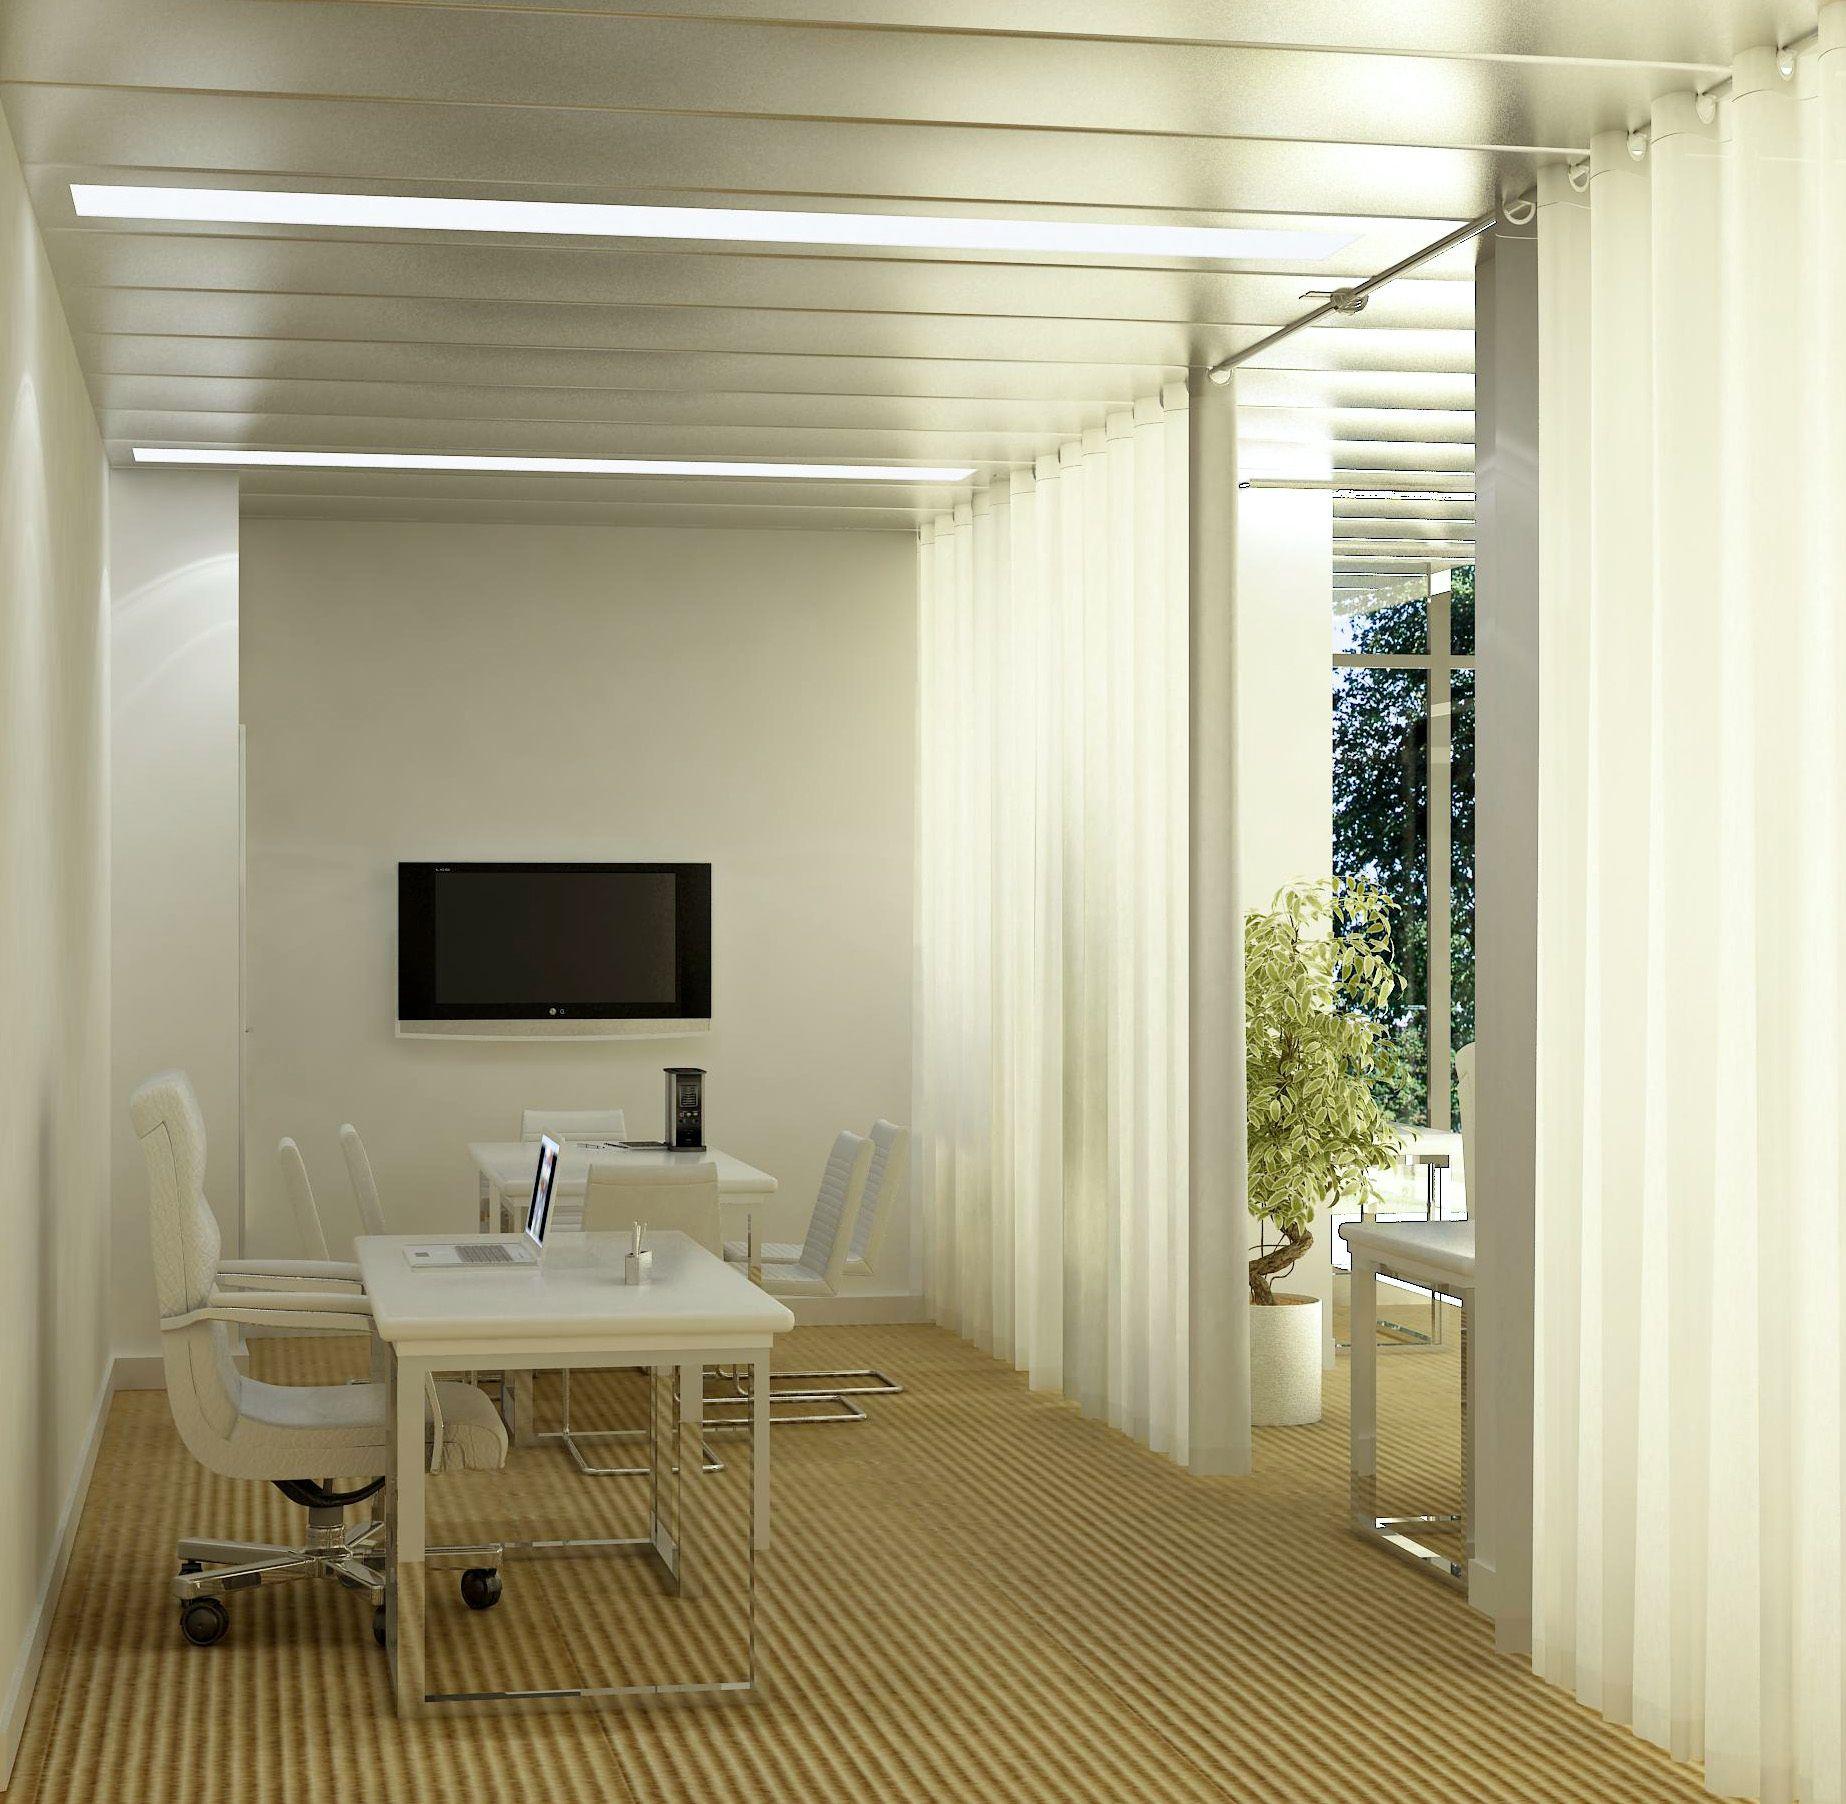 ac0dccb01edfb04dd7a2b1ff4ed039a8 Impressionnant De Table Petit Espace Concept